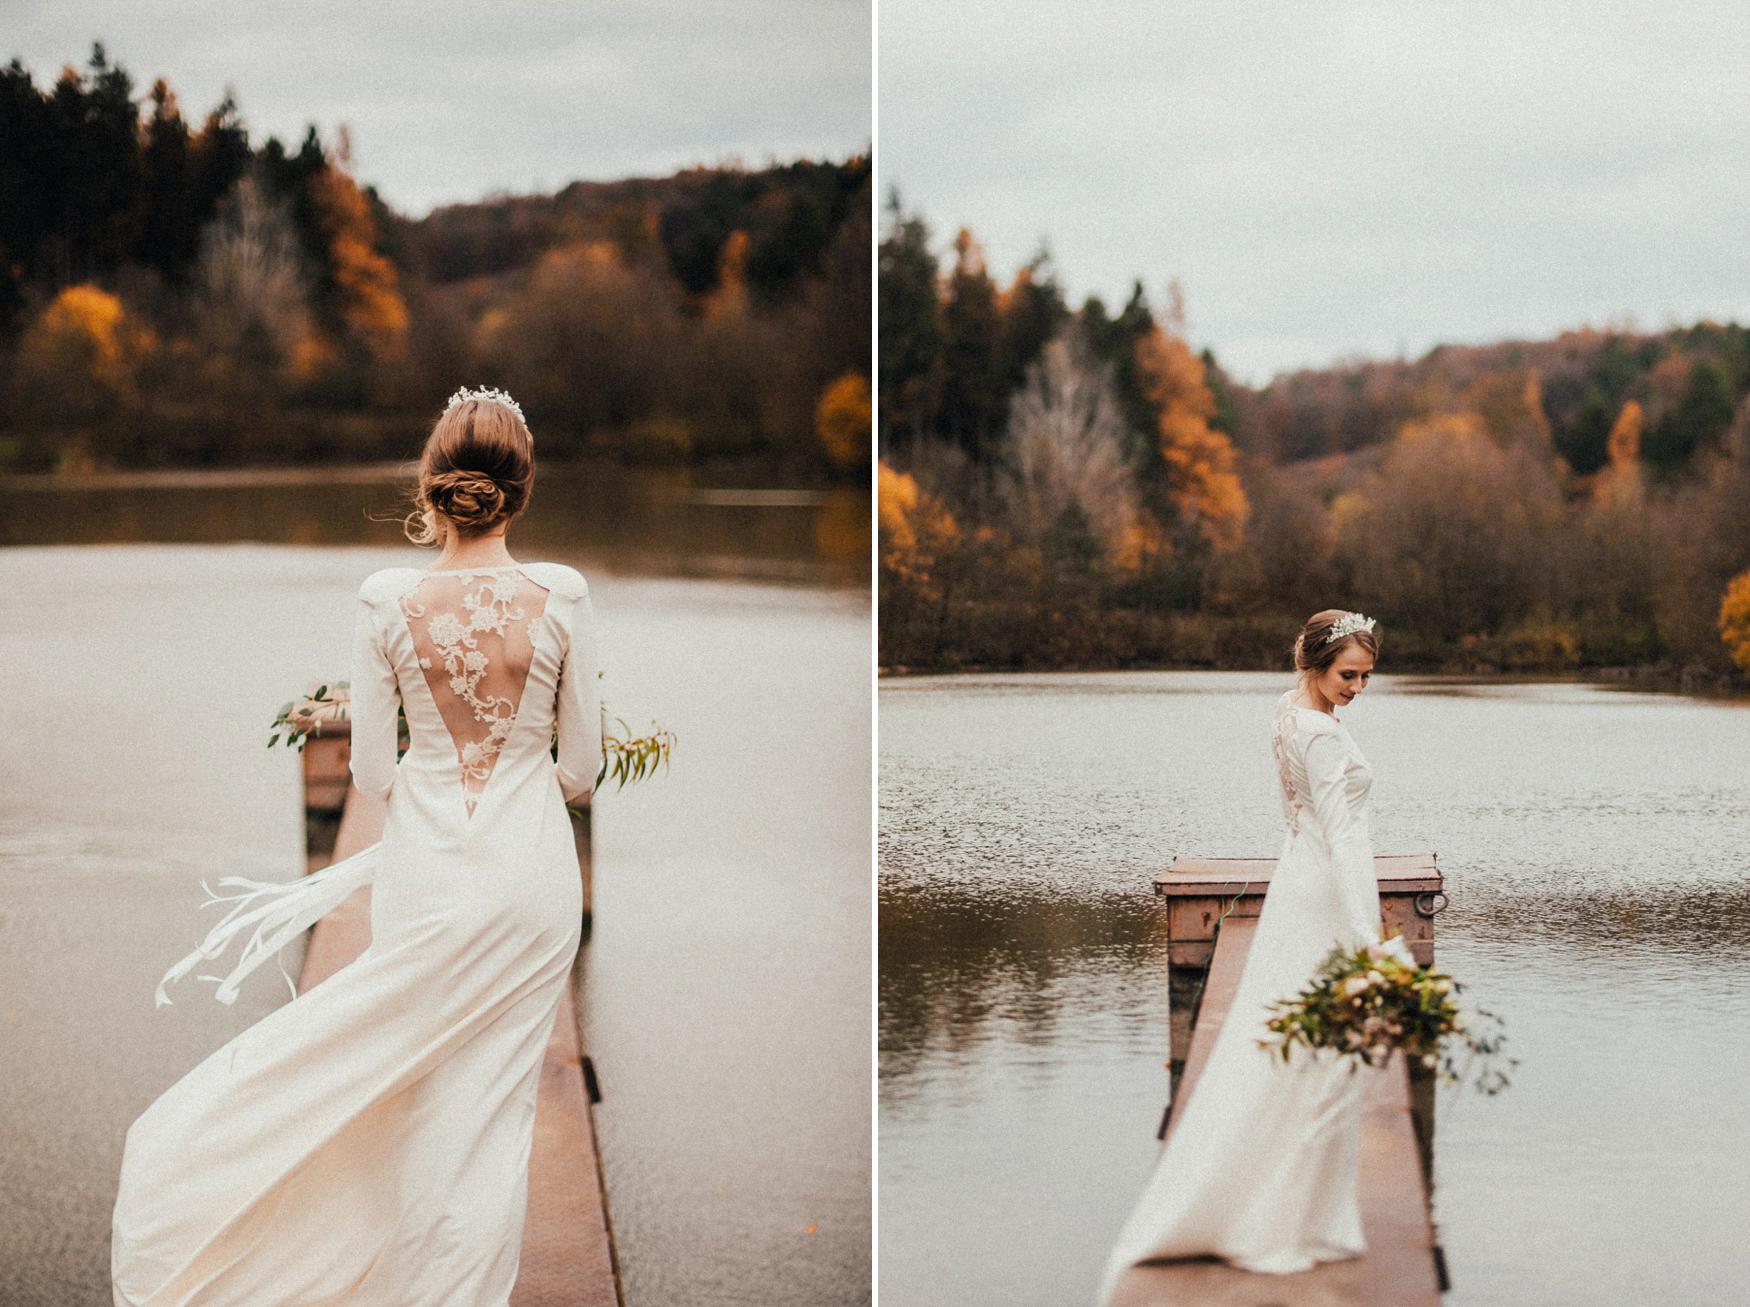 3 czech countryside rustic wedding - svatba zikmundov008.jpg